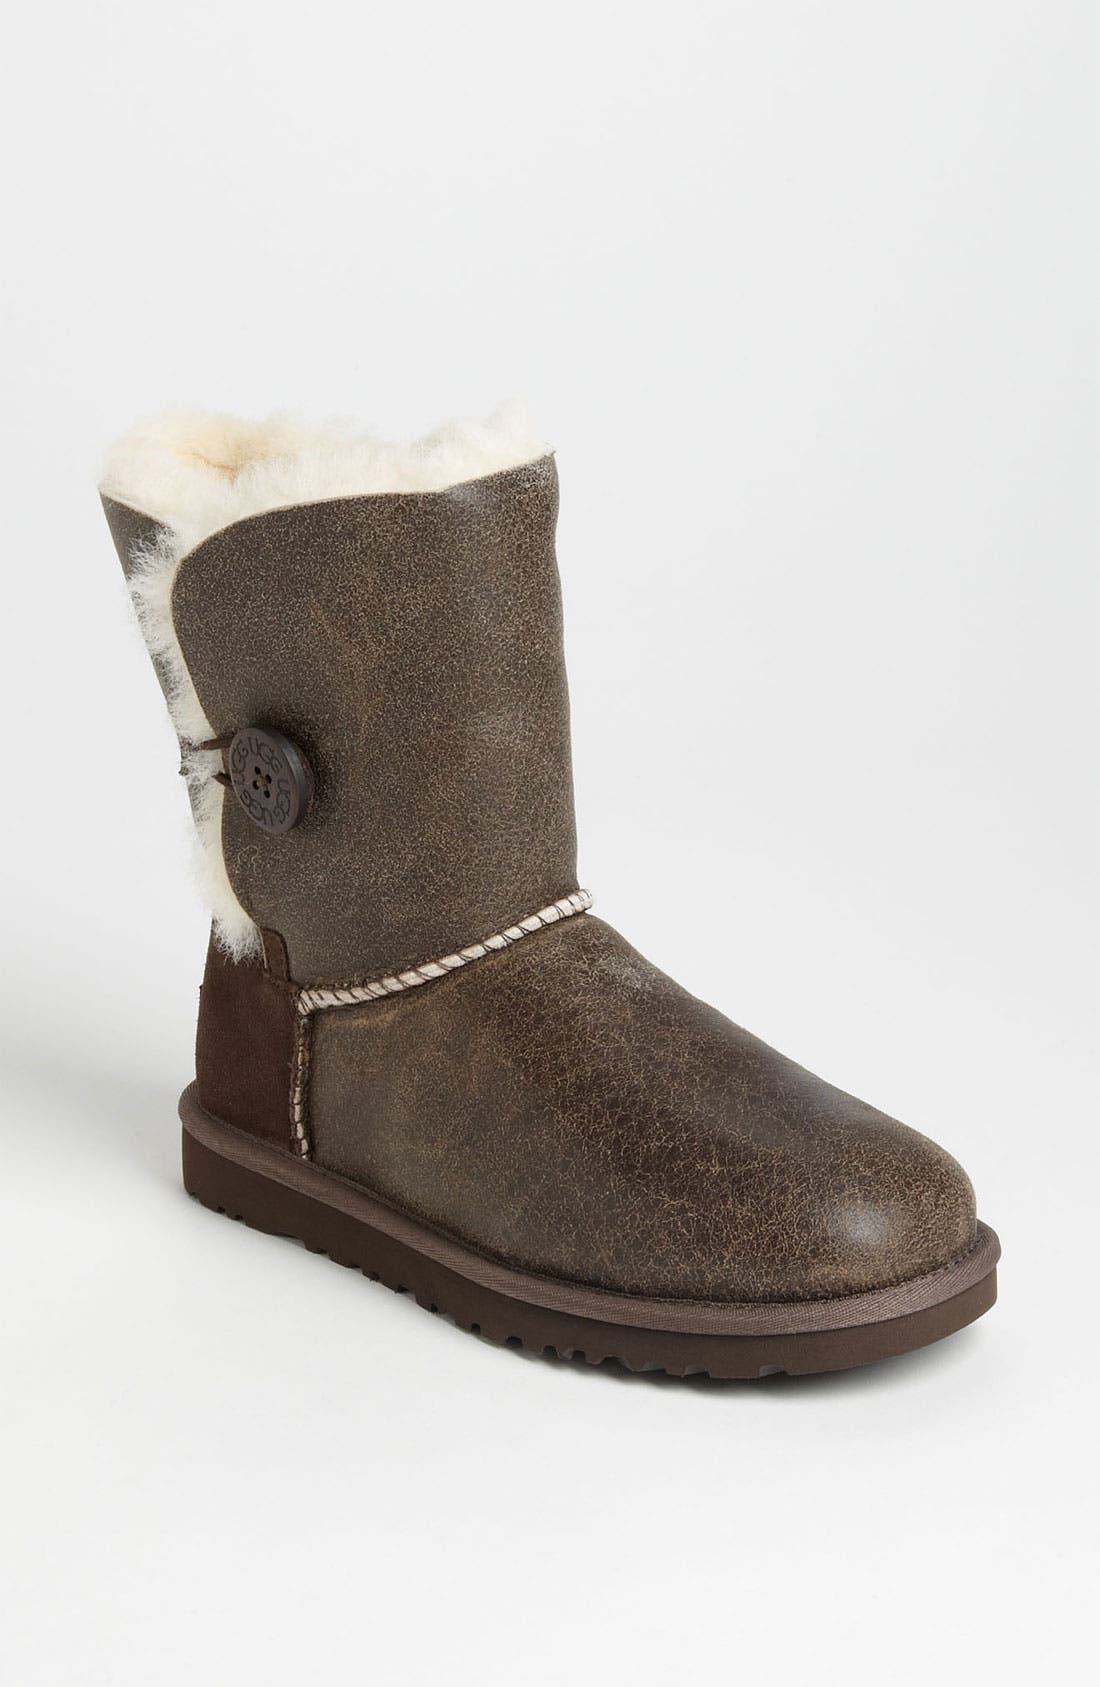 Main Image - UGG® Australia 'Bailey Button Bomber' Boot (Women)